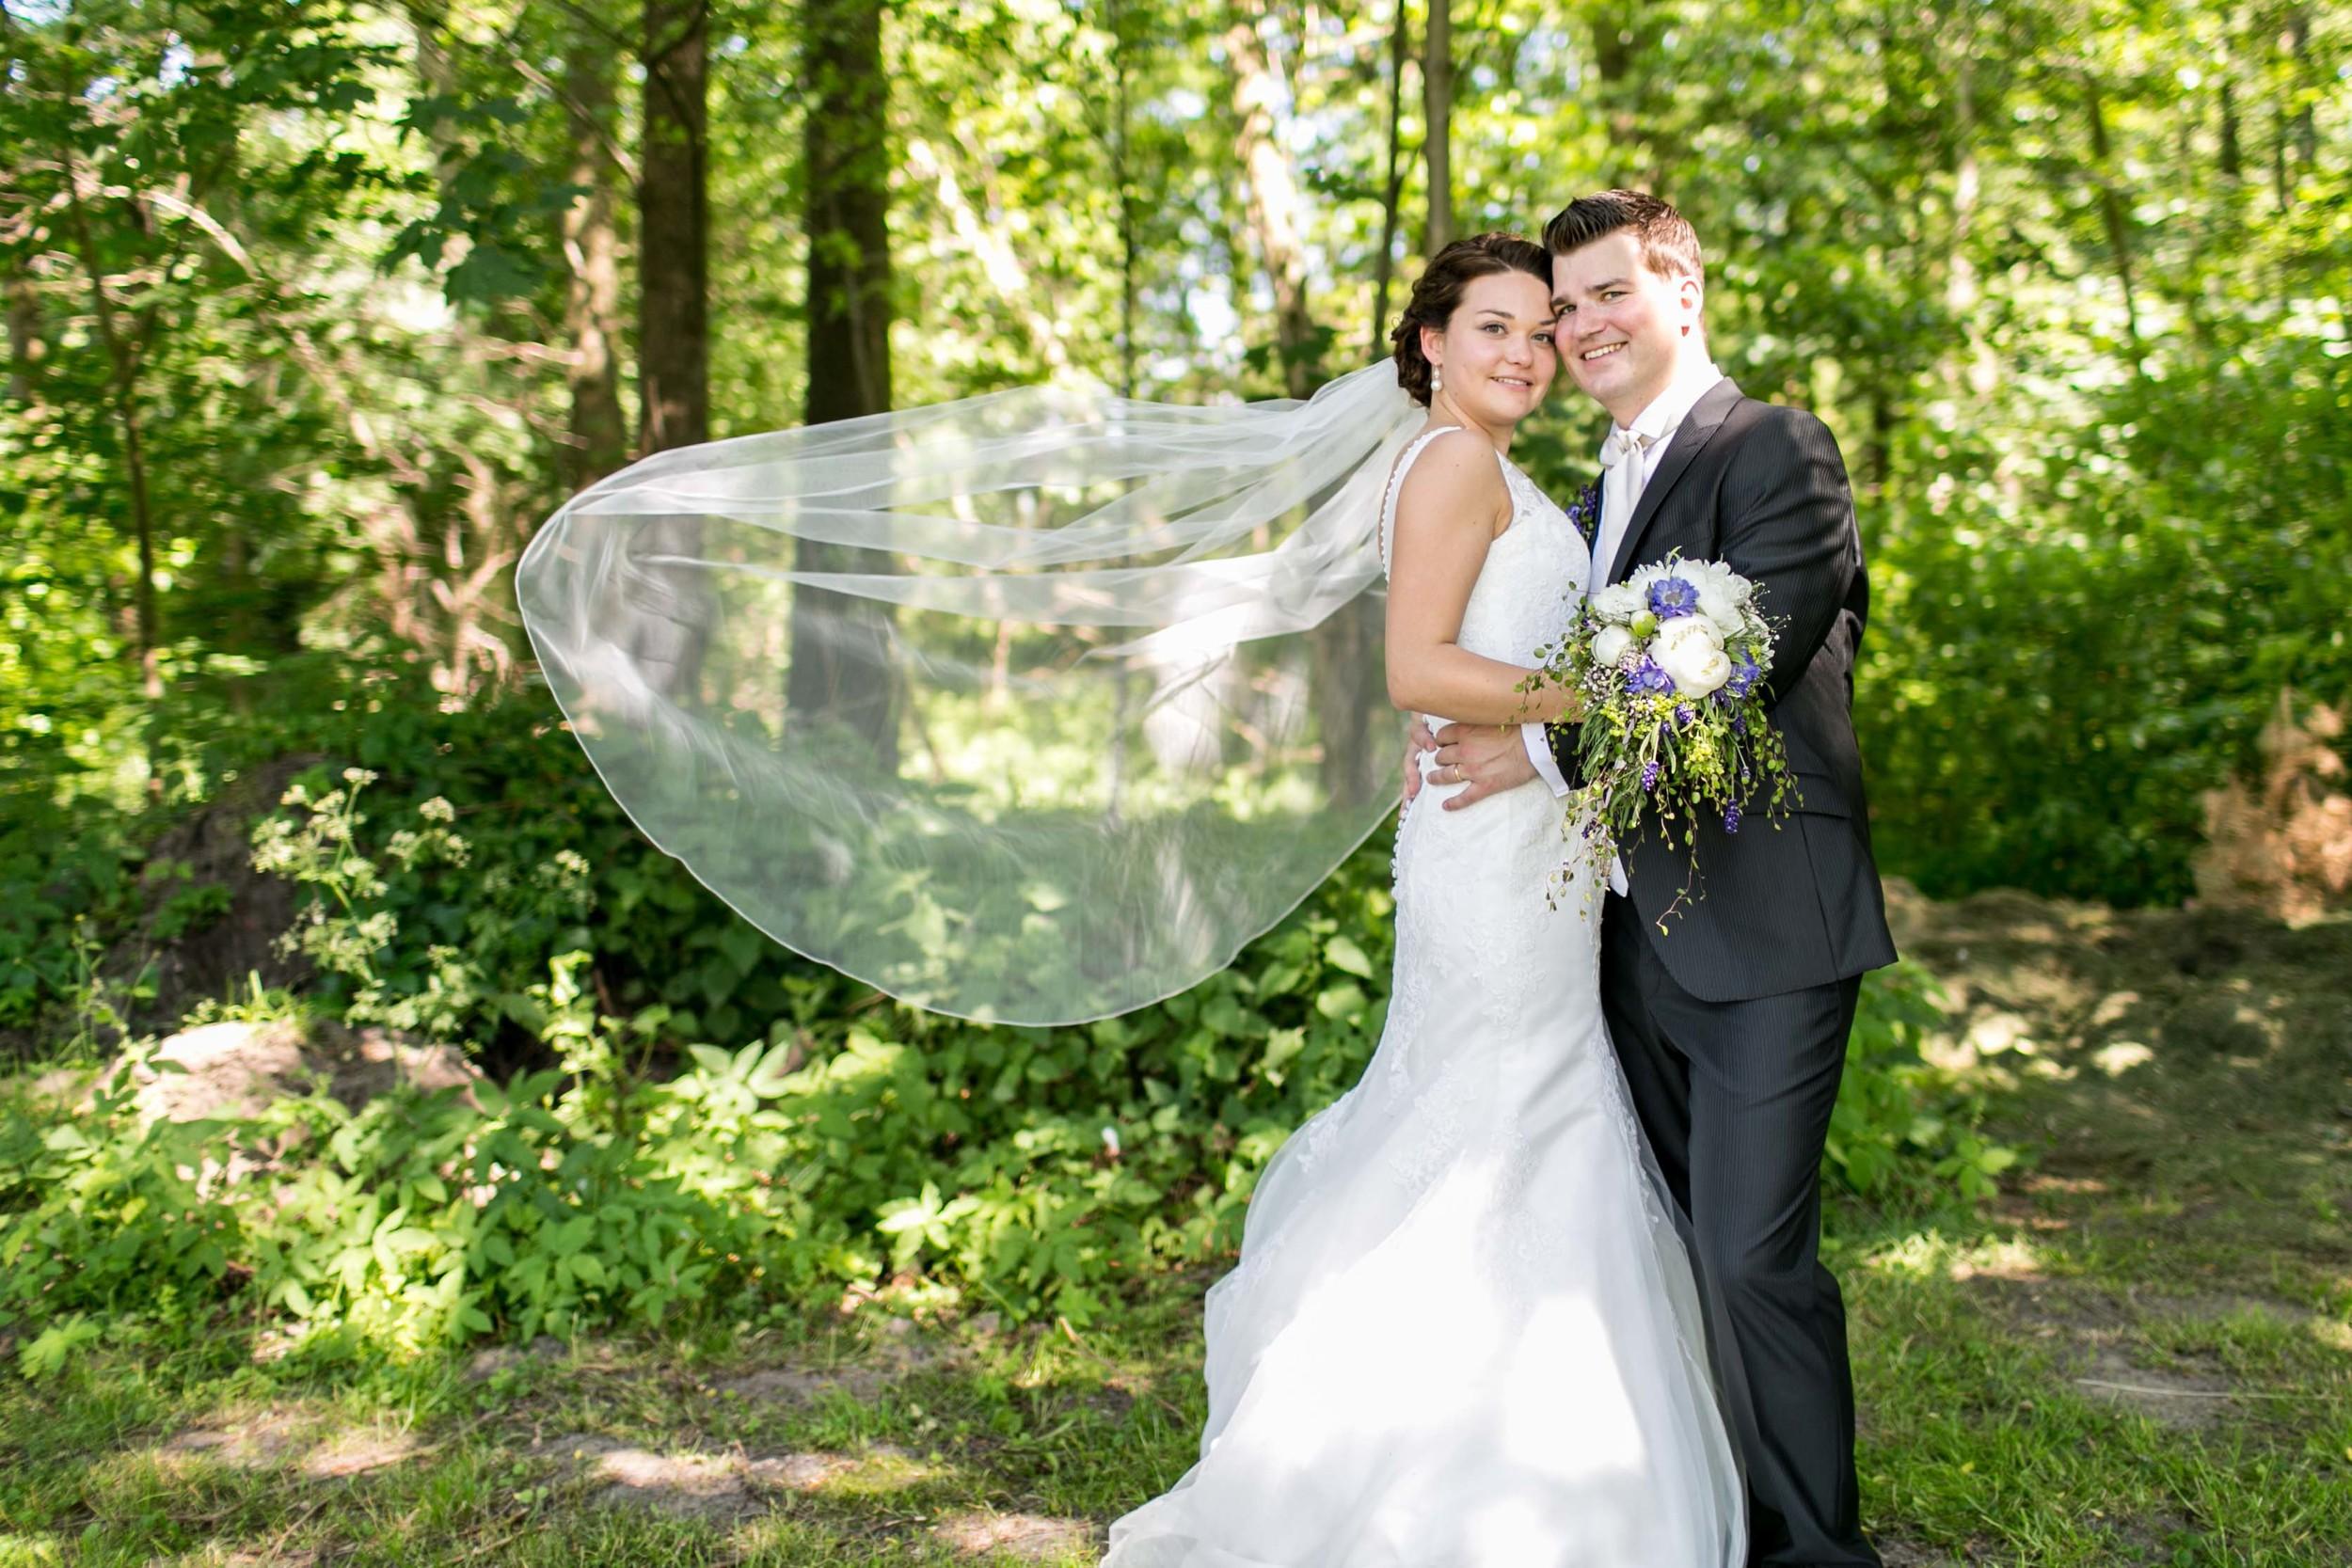 Hochzeitsfotografie Berlin_Fran Burrows Fotografie-225.jpg